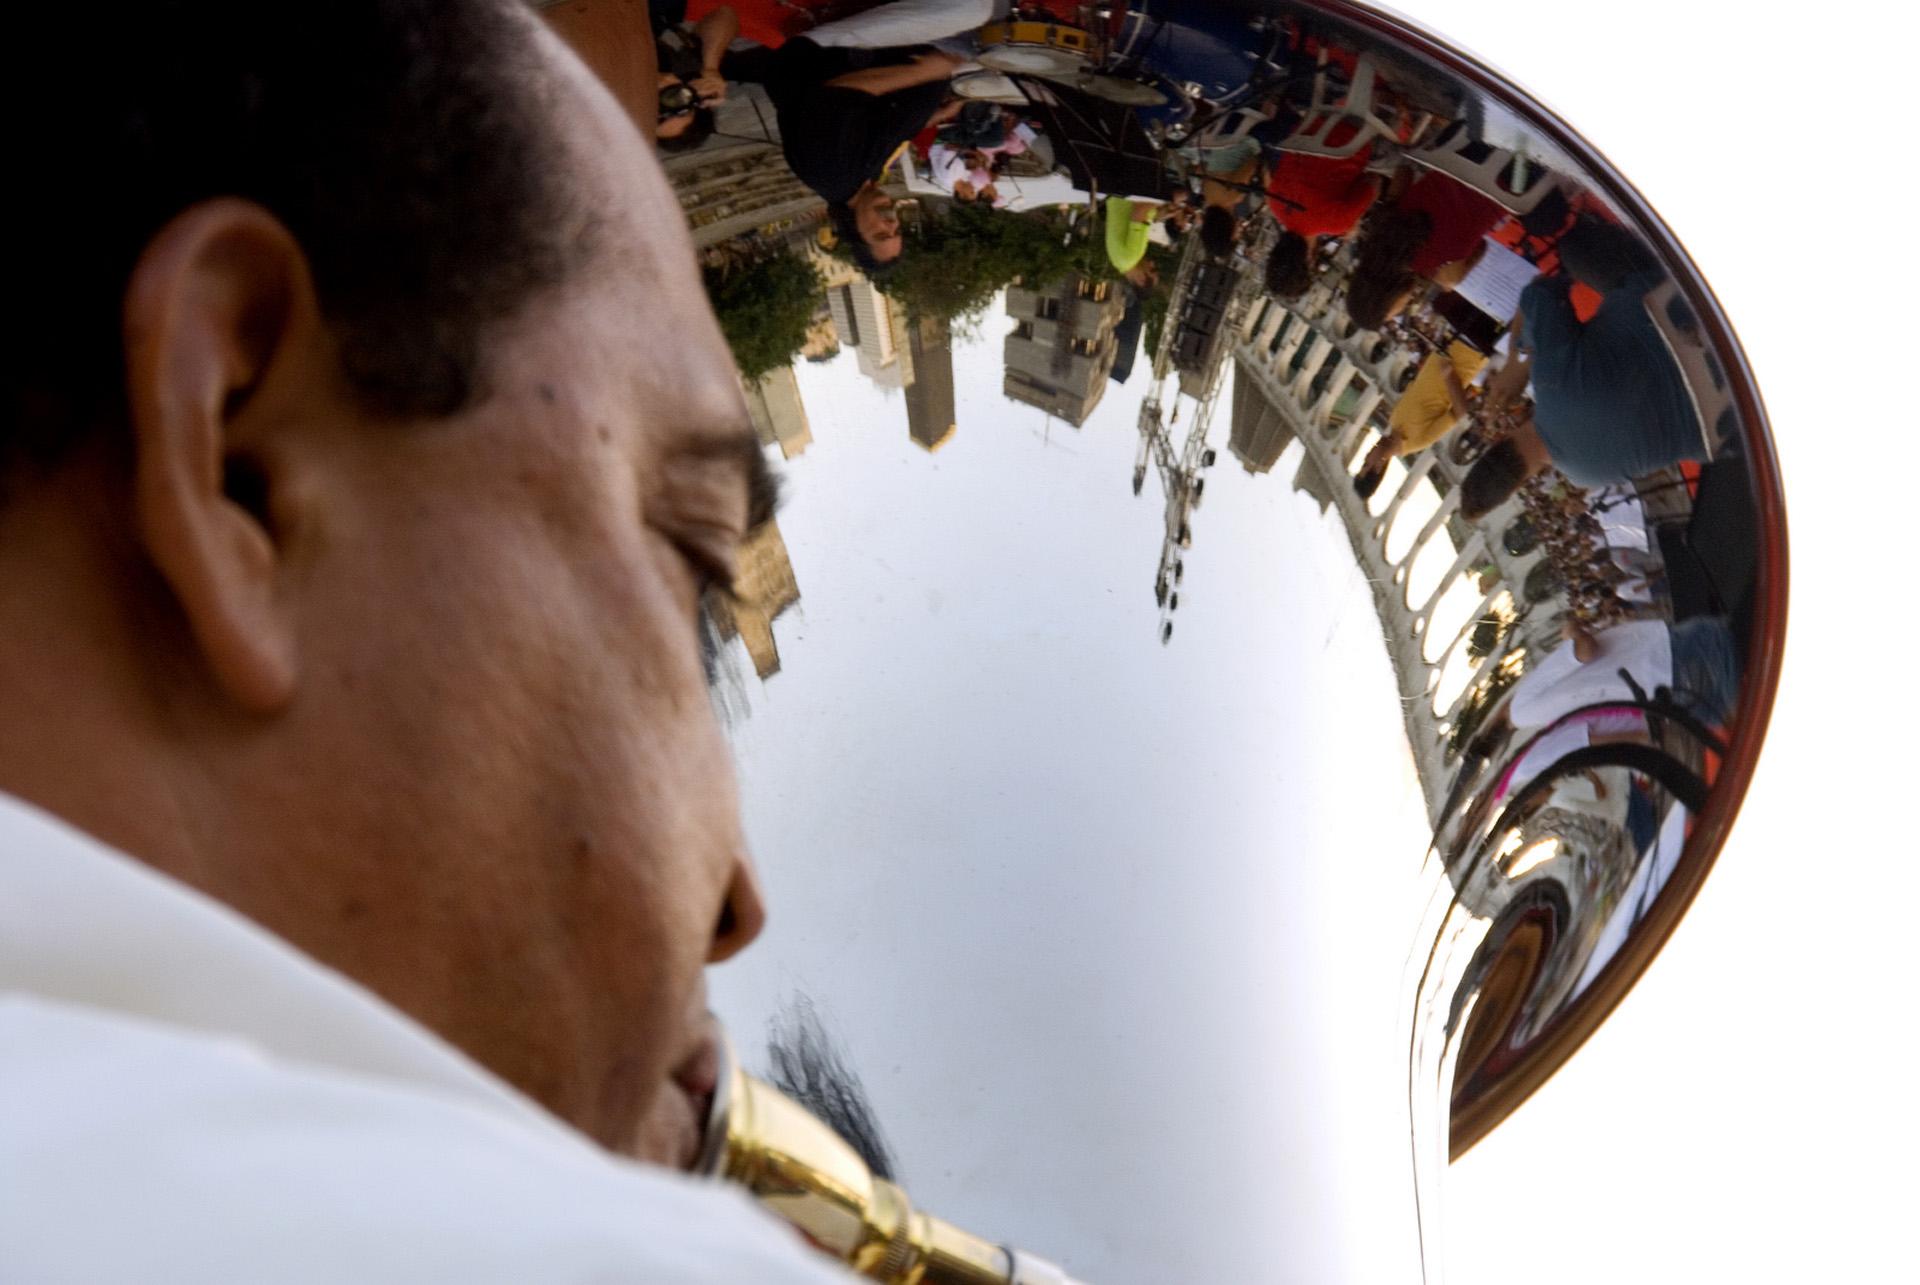 MarchÛdromo-Abertura/Lapa/Rio de Janeiro-02/12/2006.